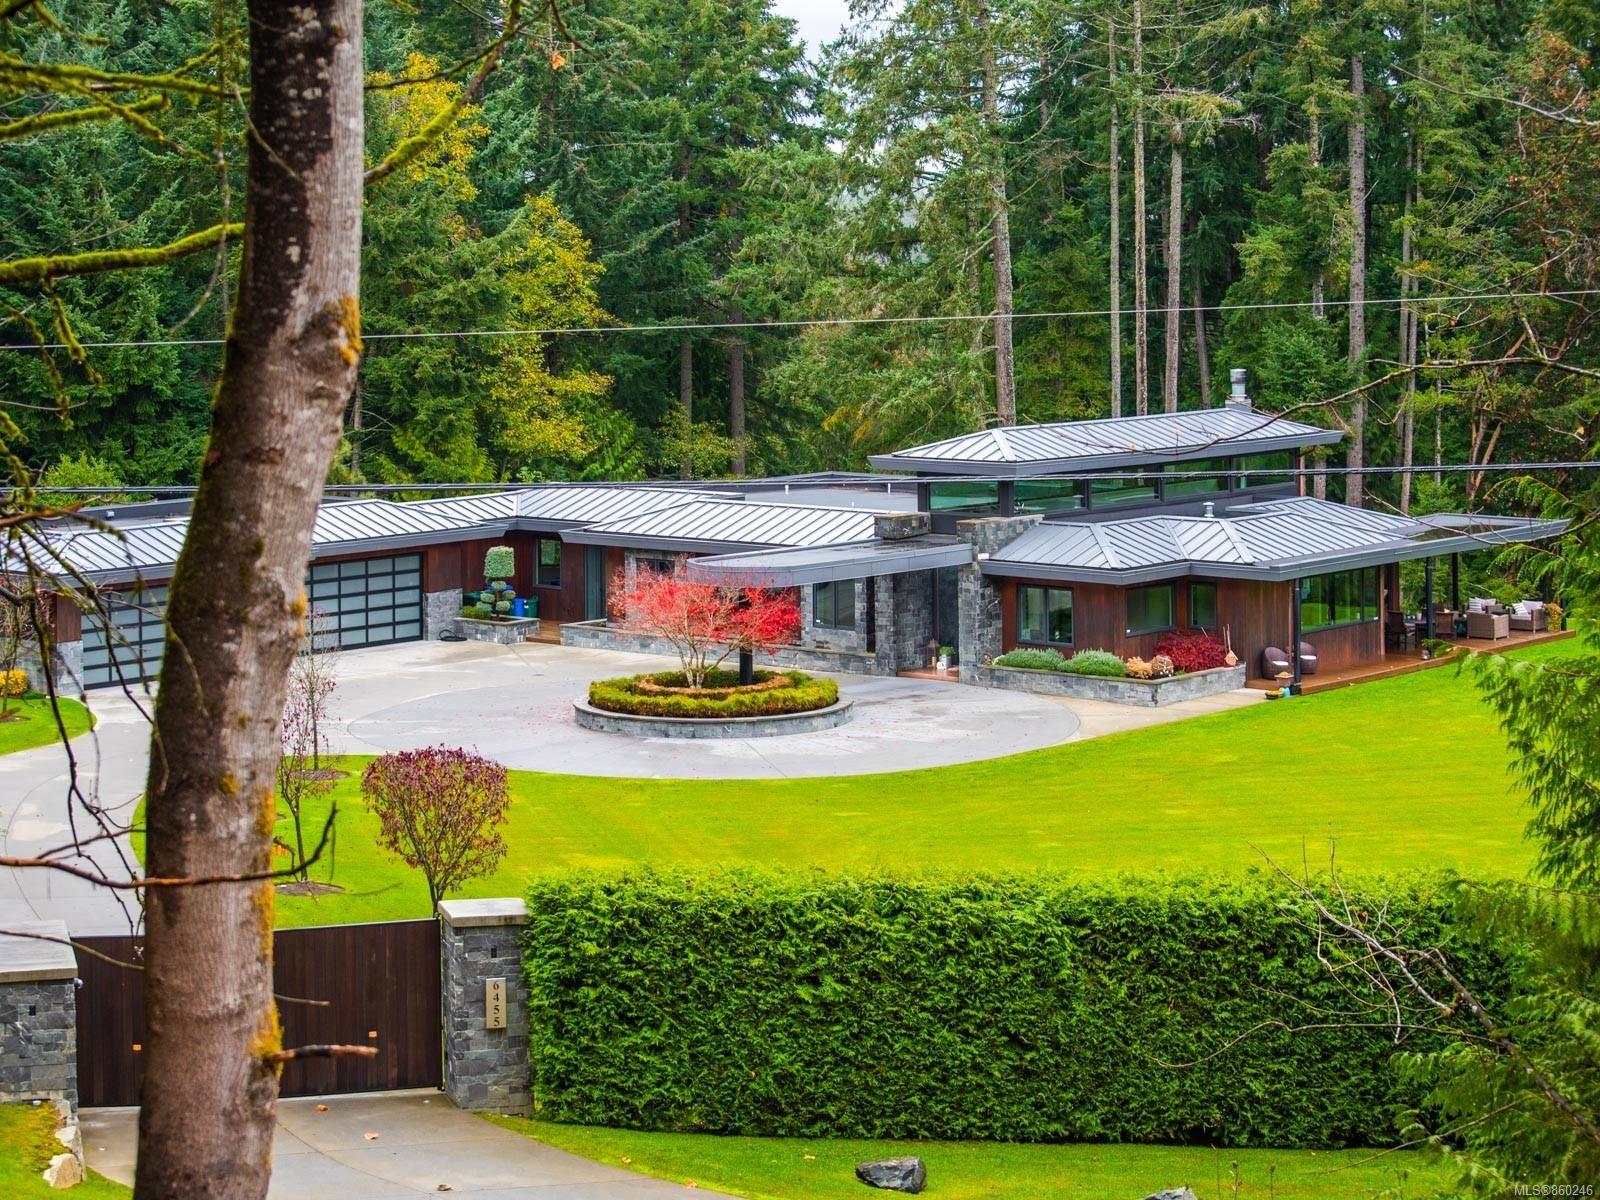 Main Photo: 6455 Phantom Rd in : Na Upper Lantzville House for sale (Nanaimo)  : MLS®# 860246